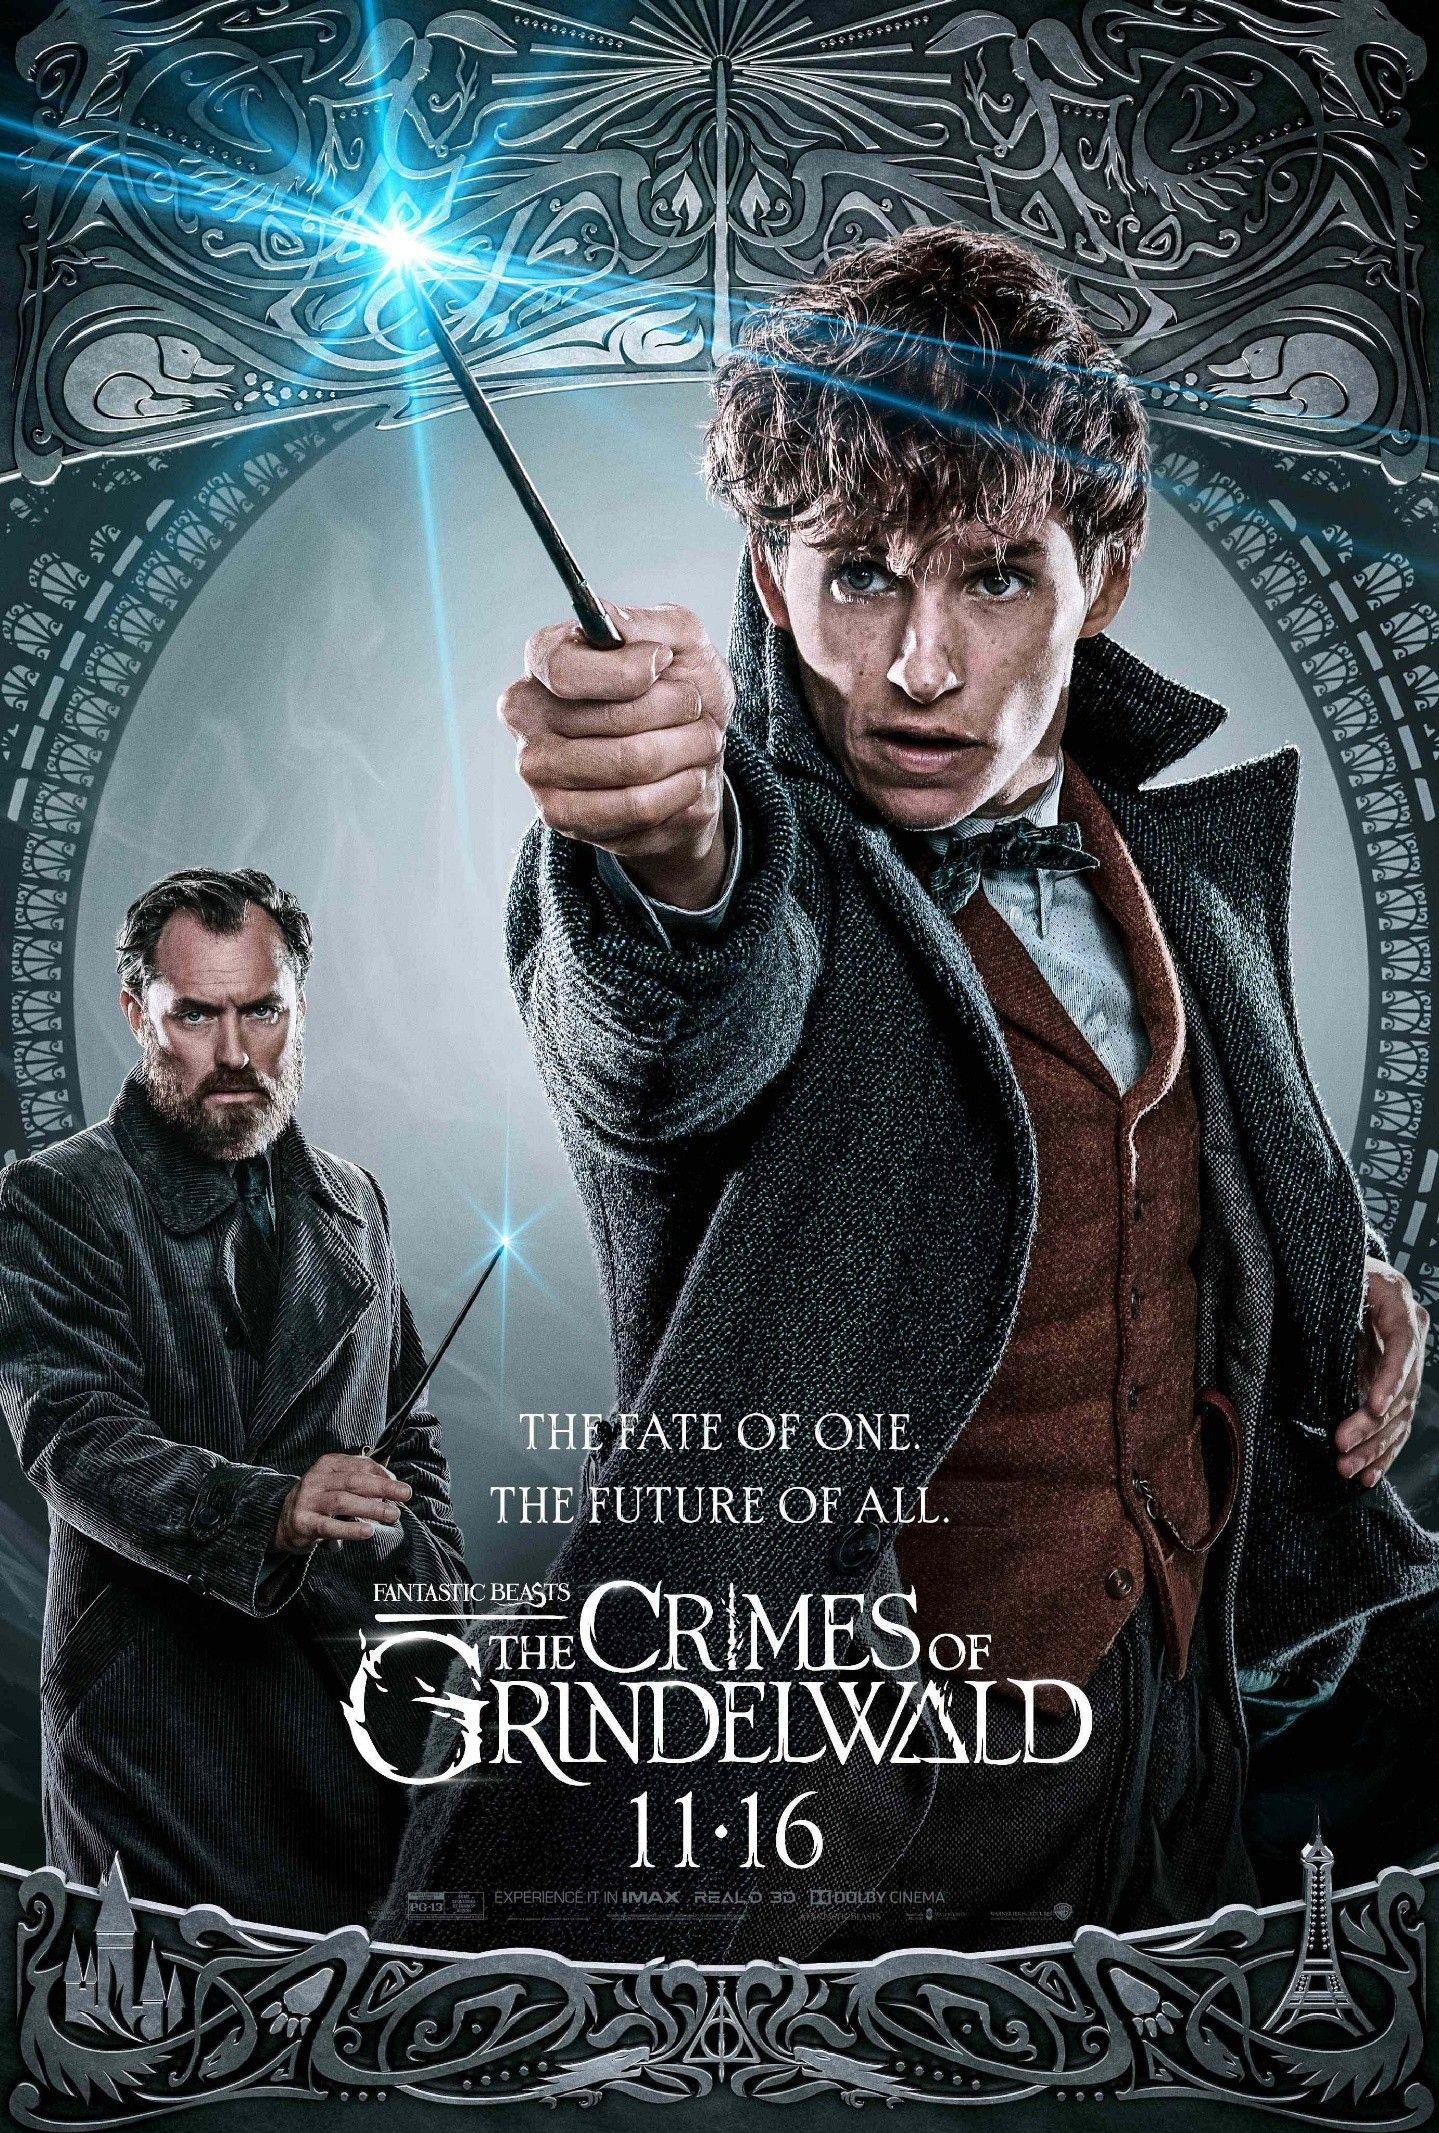 Regarder Animaux Fantastiques 2 Les Crimes De Grindelwald En Streaming Epingle Par Christophe Sur Harry Potter Les Animaux Fantastiques Animaux Fantastiques Les Animeaux Fantastique